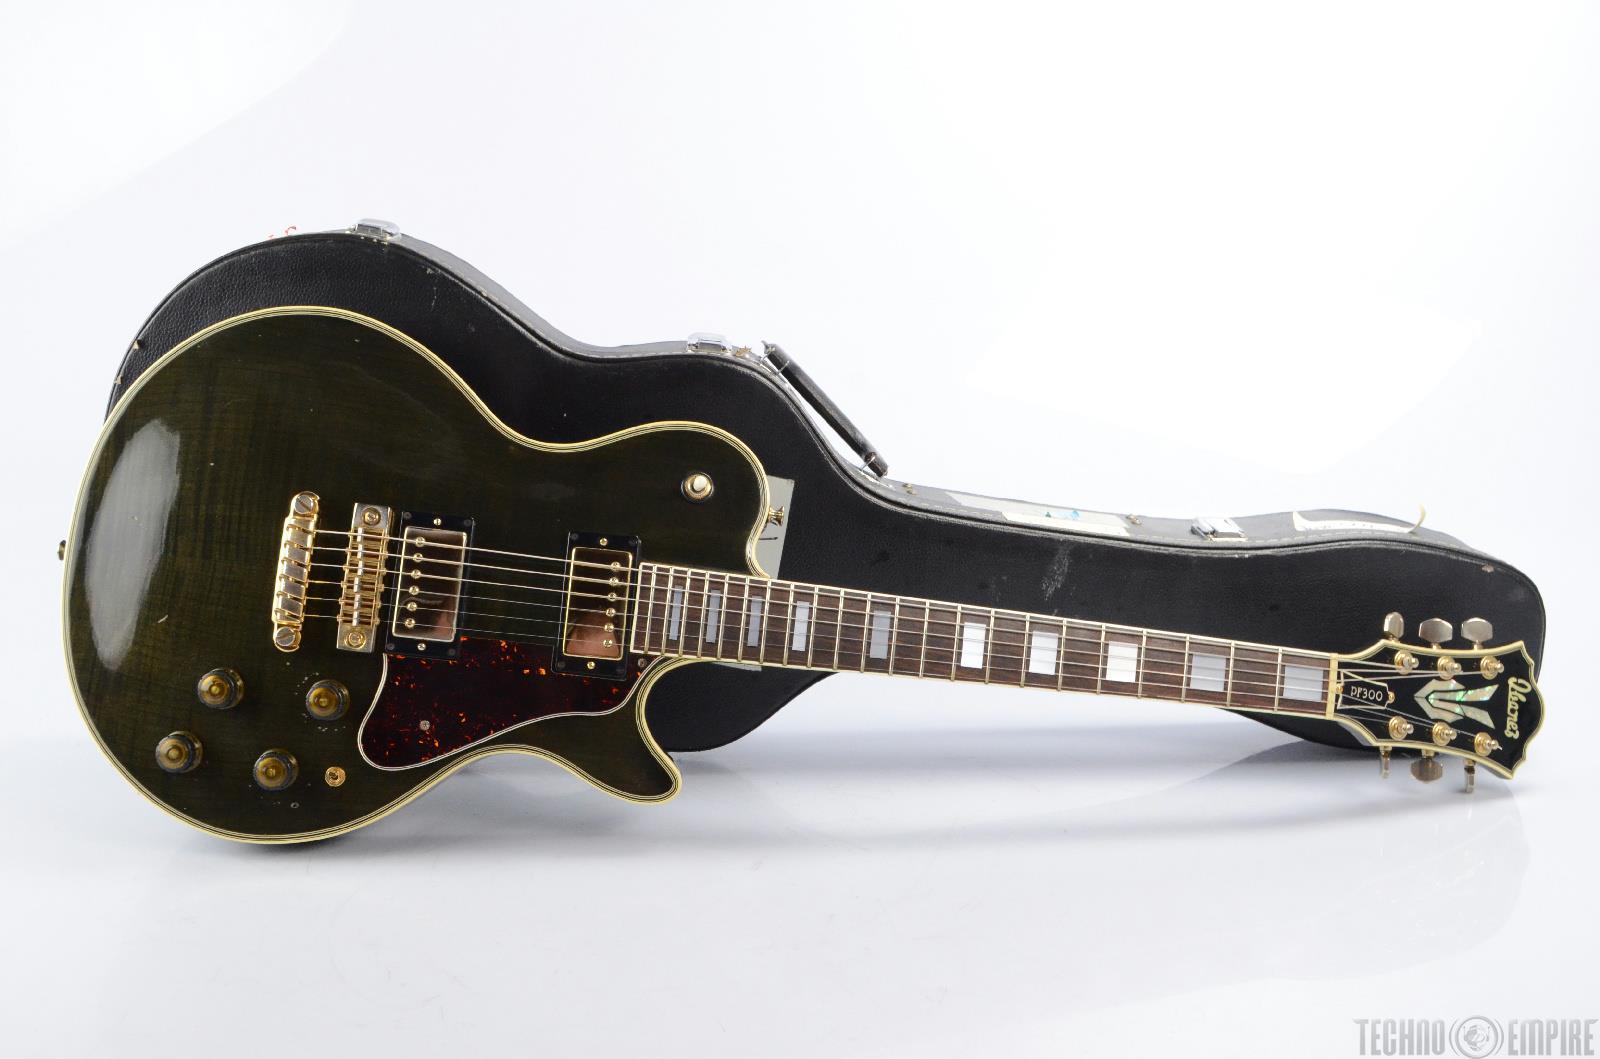 Vintage Ibanez Pf300 Performer Electric Guitar W